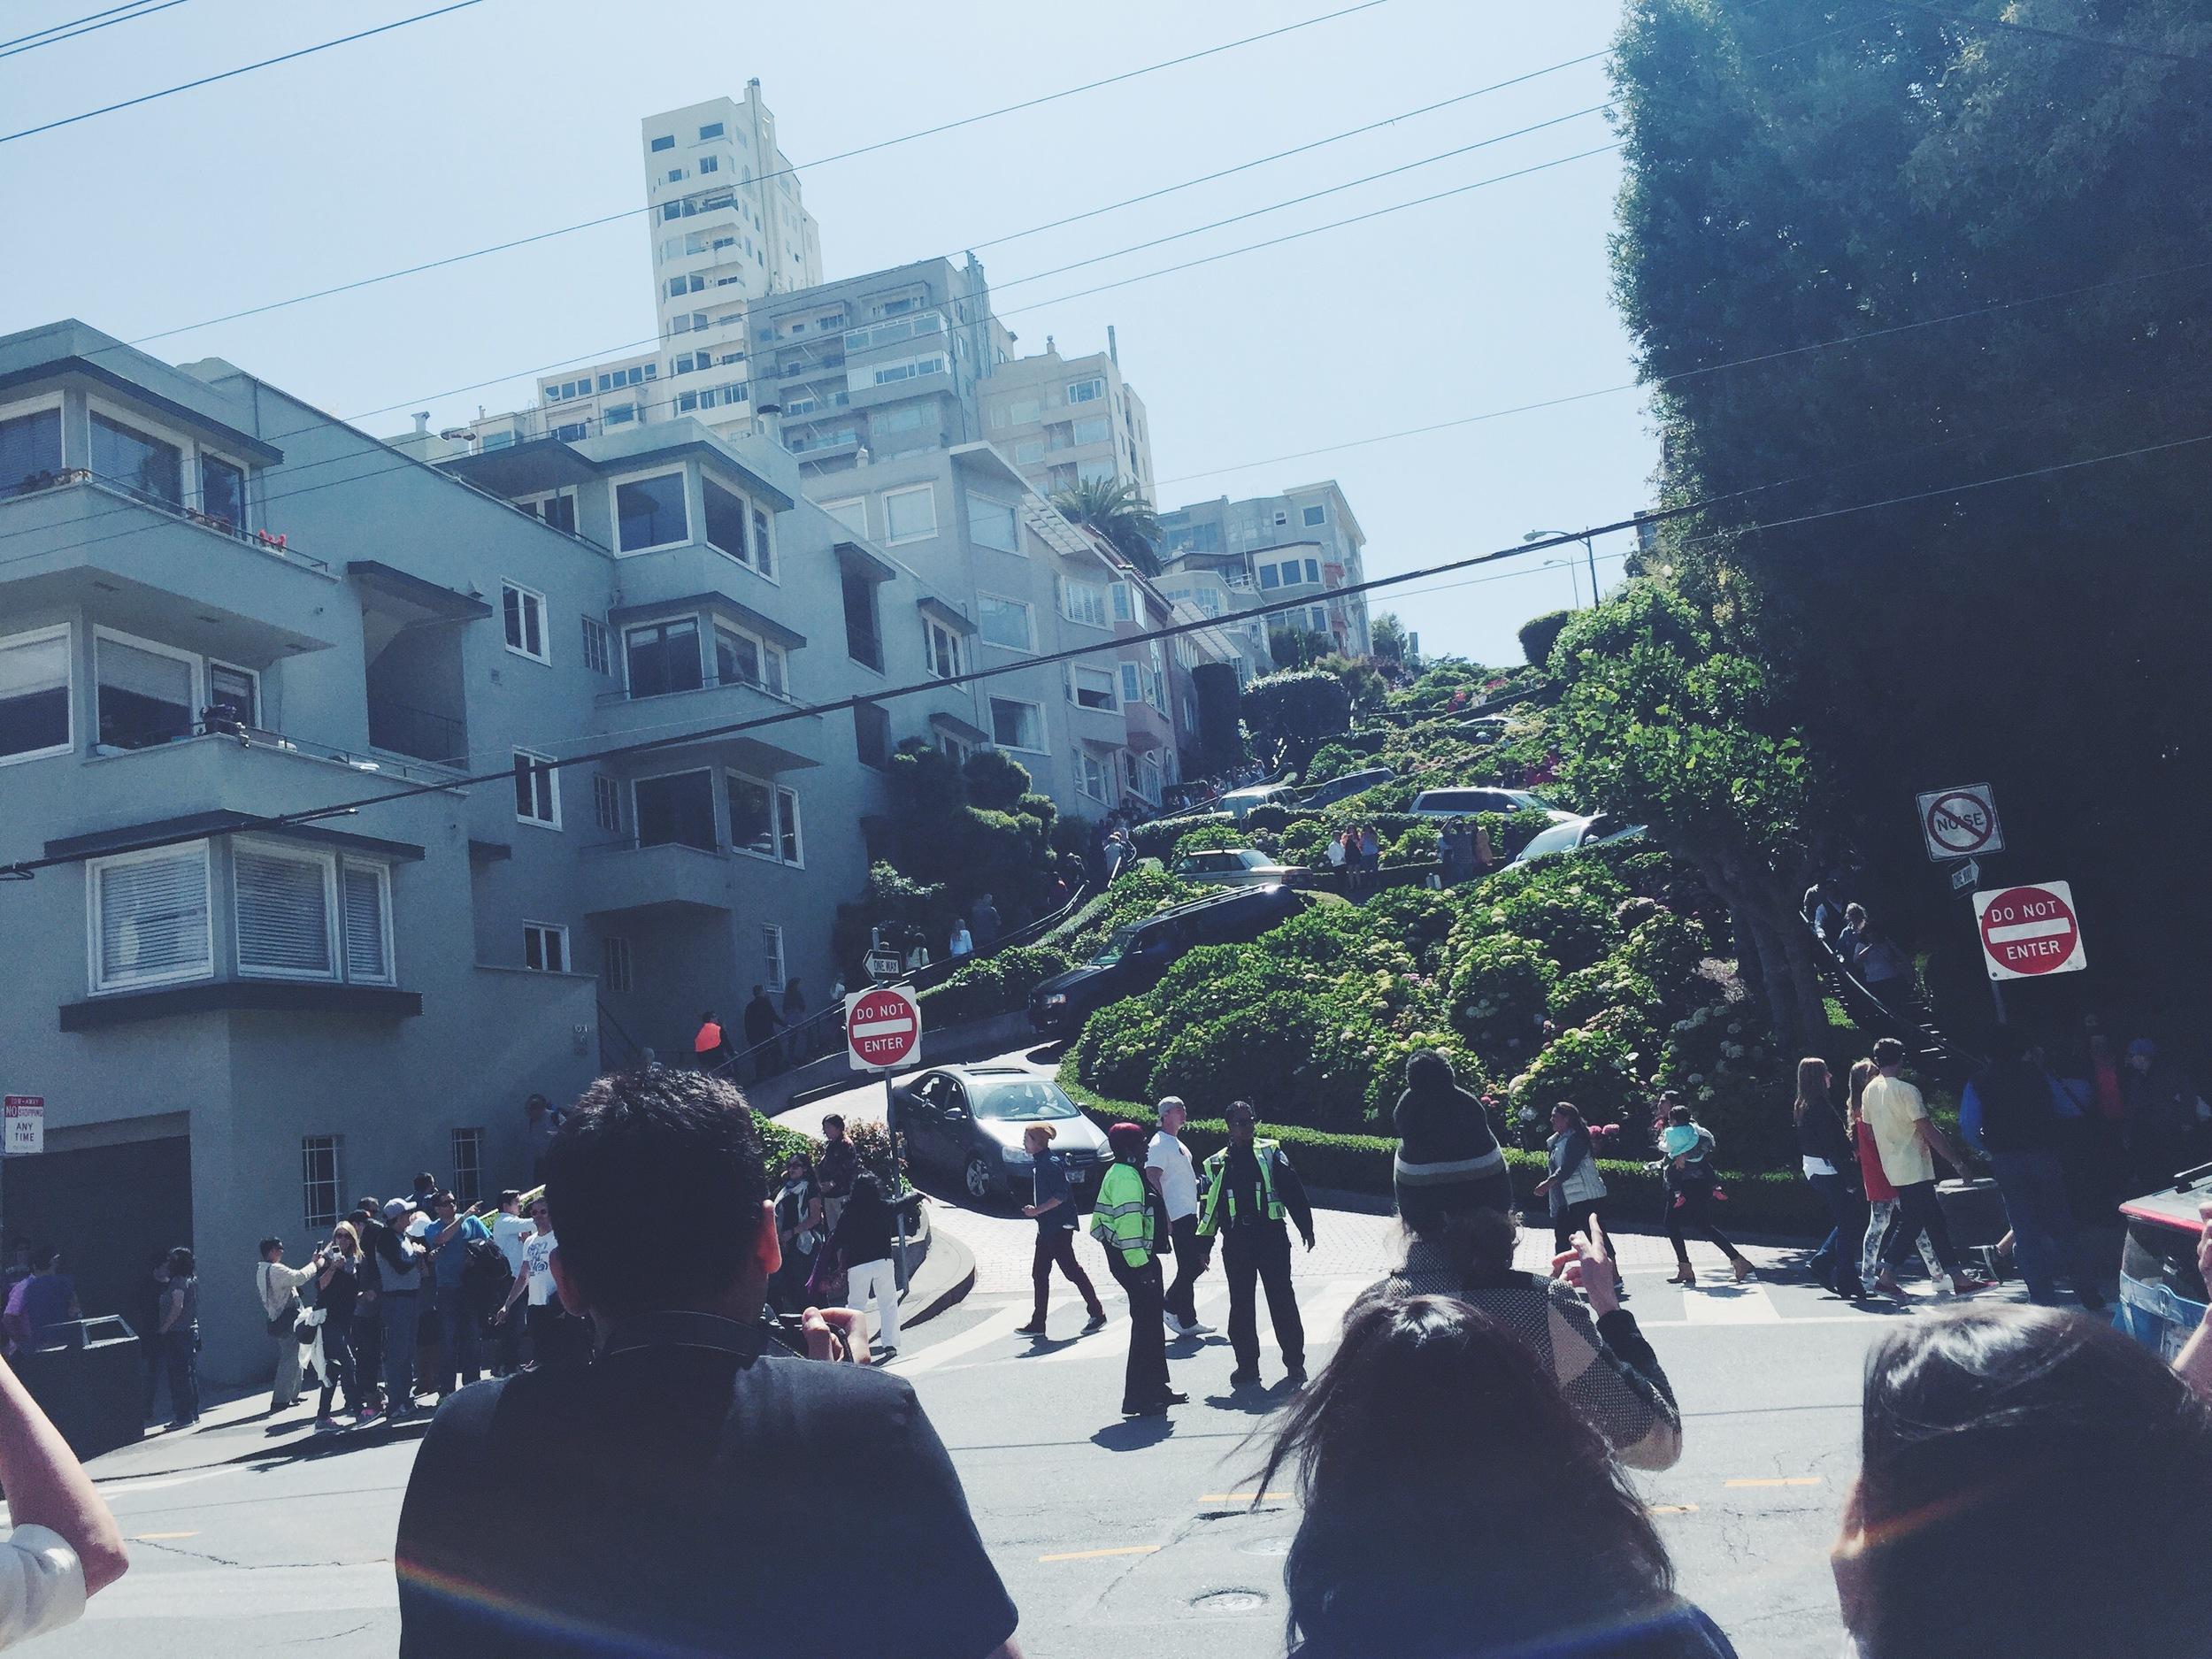 Lumbard Street - View